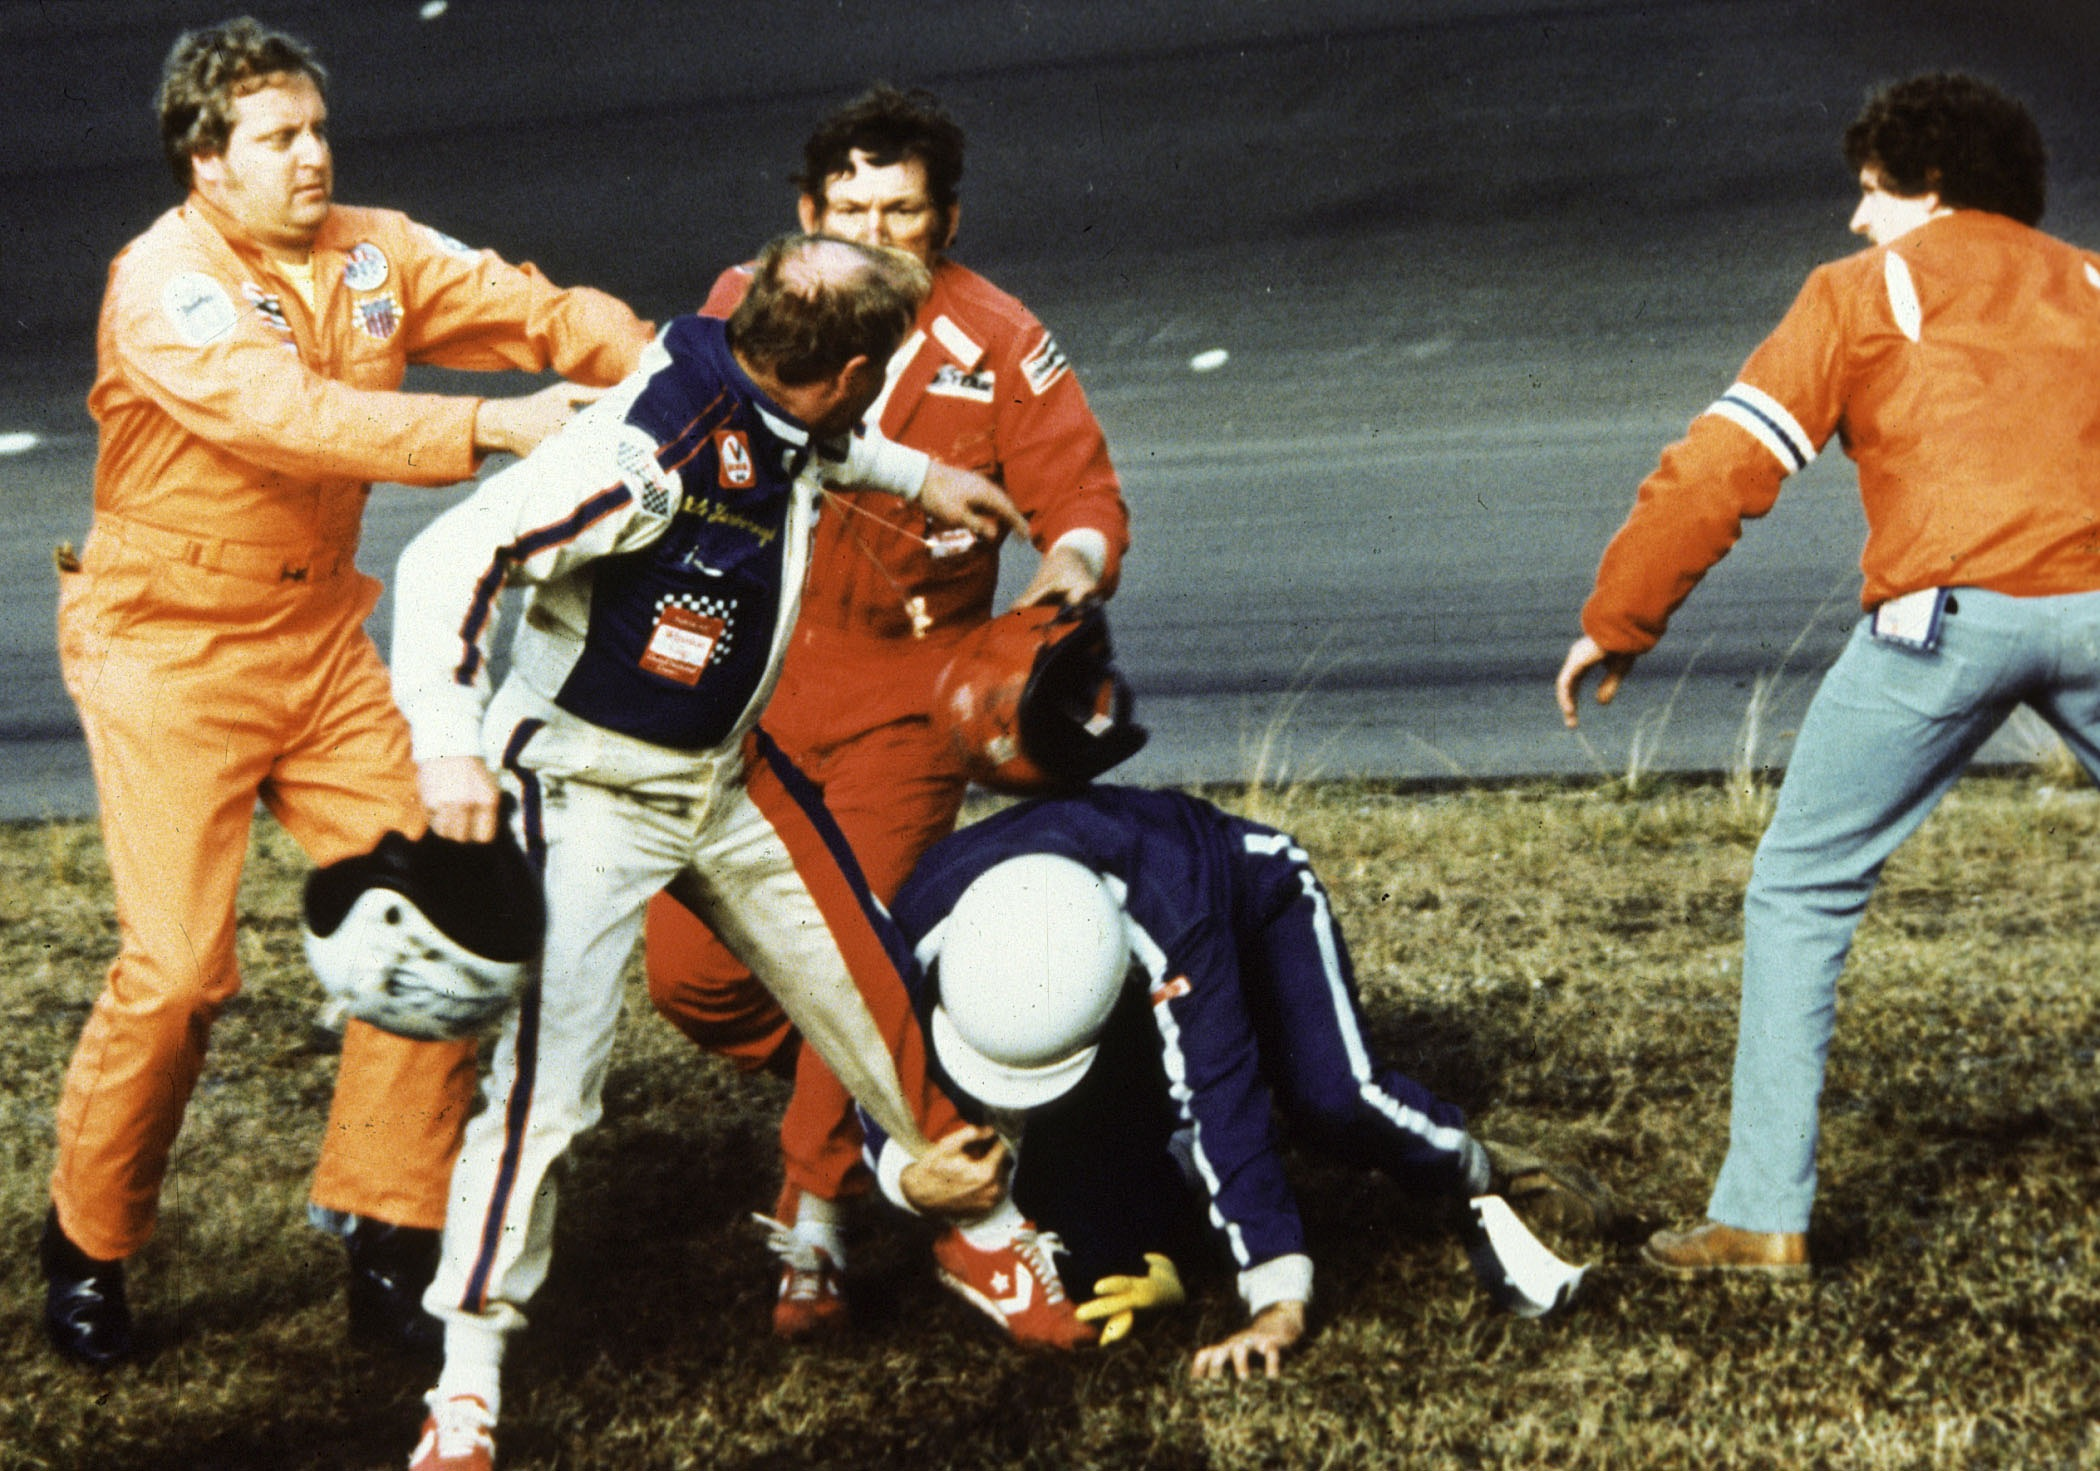 Squier's Legendary Daytona 500 Call